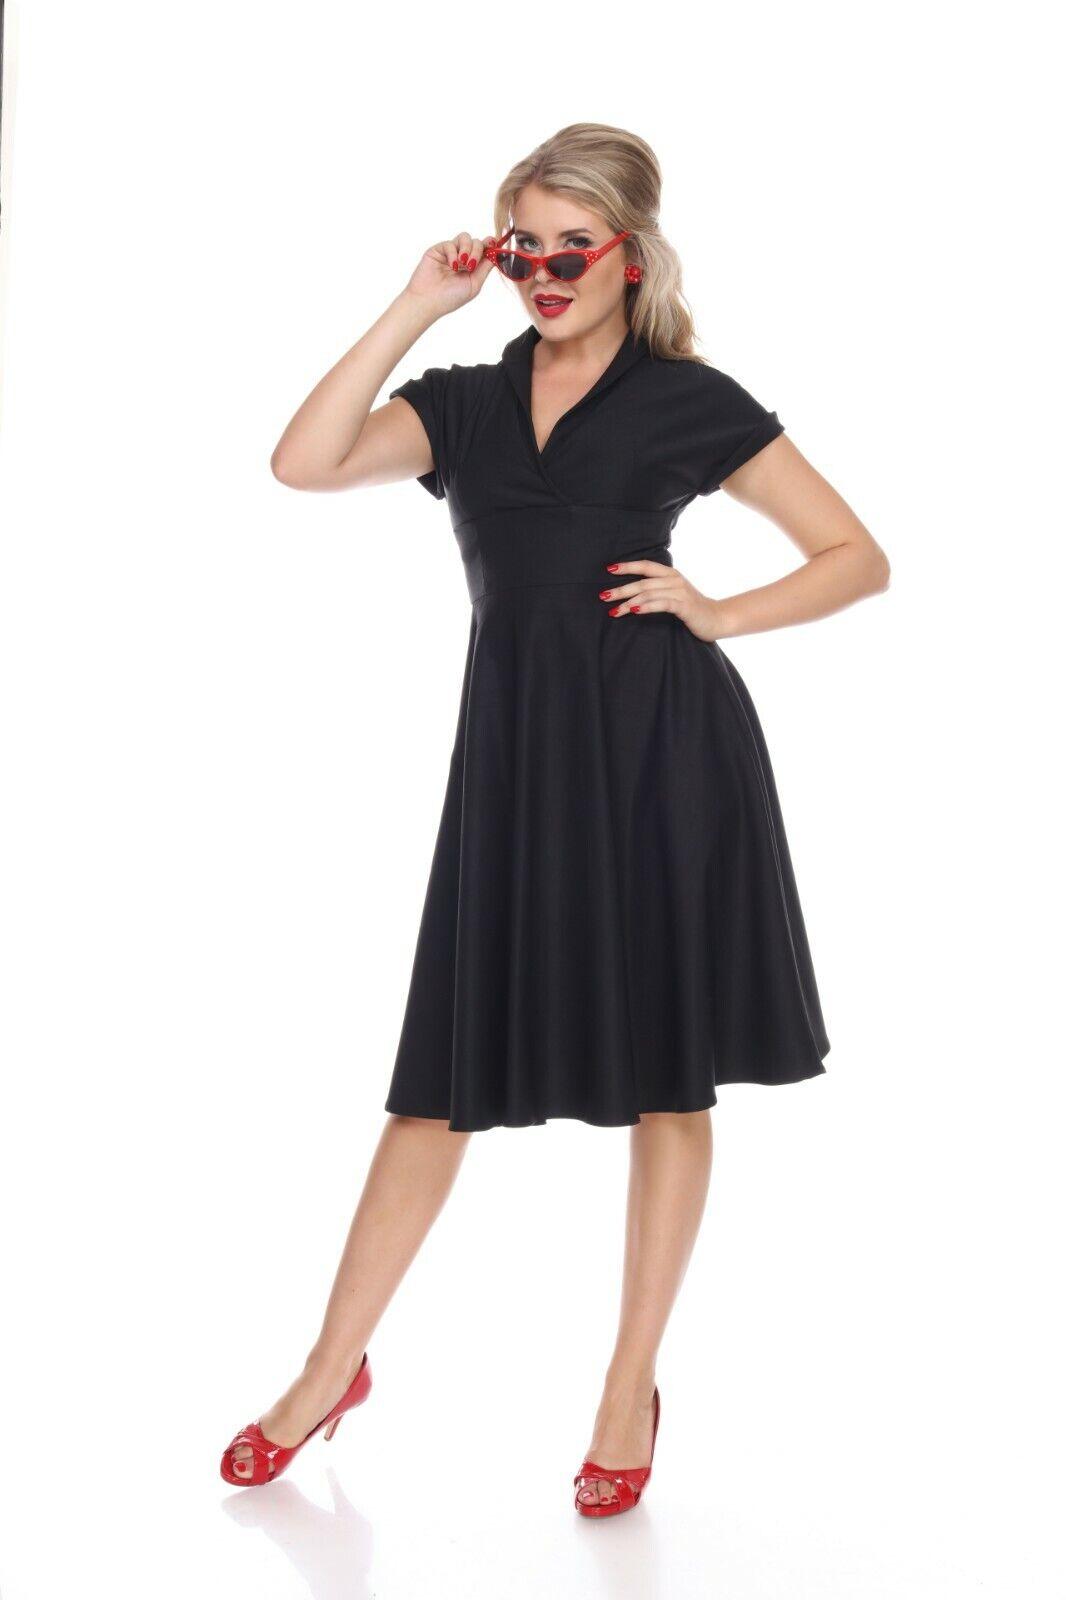 Bettie Page Meet Me at the Watercooler Dress - schwarz